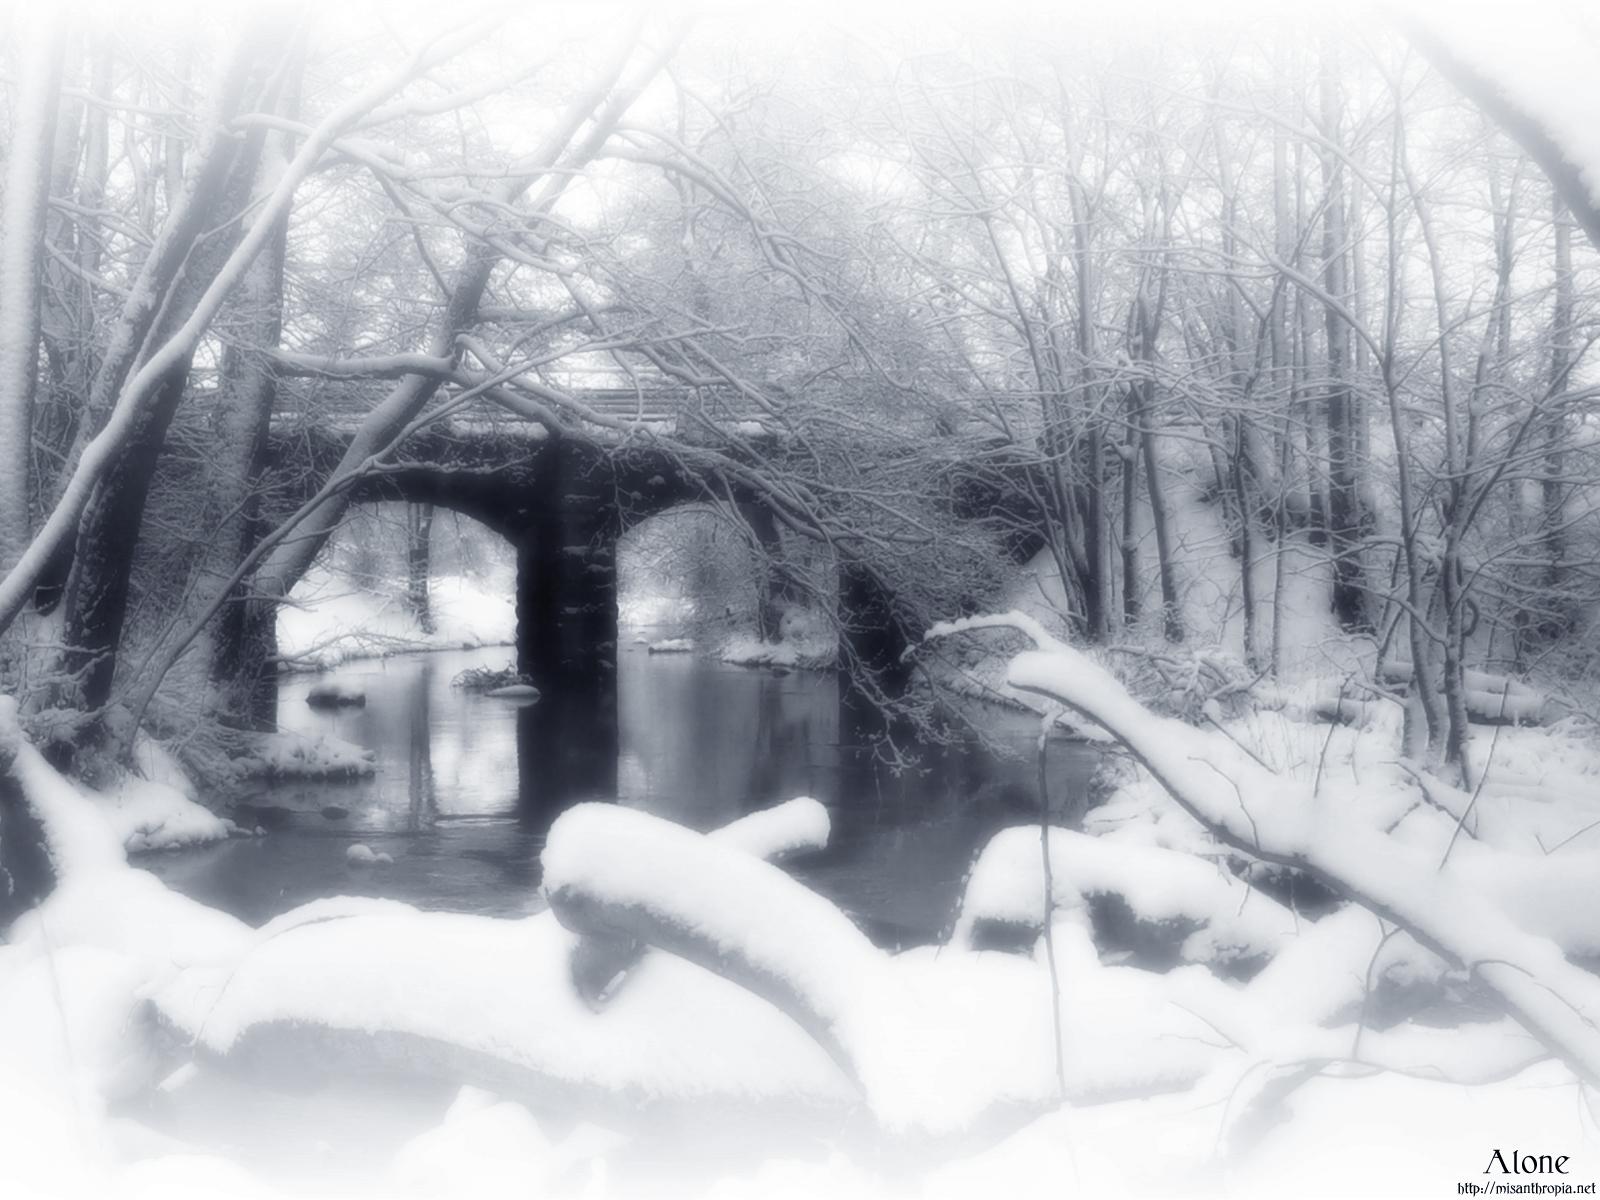 winter wallpapers hd download